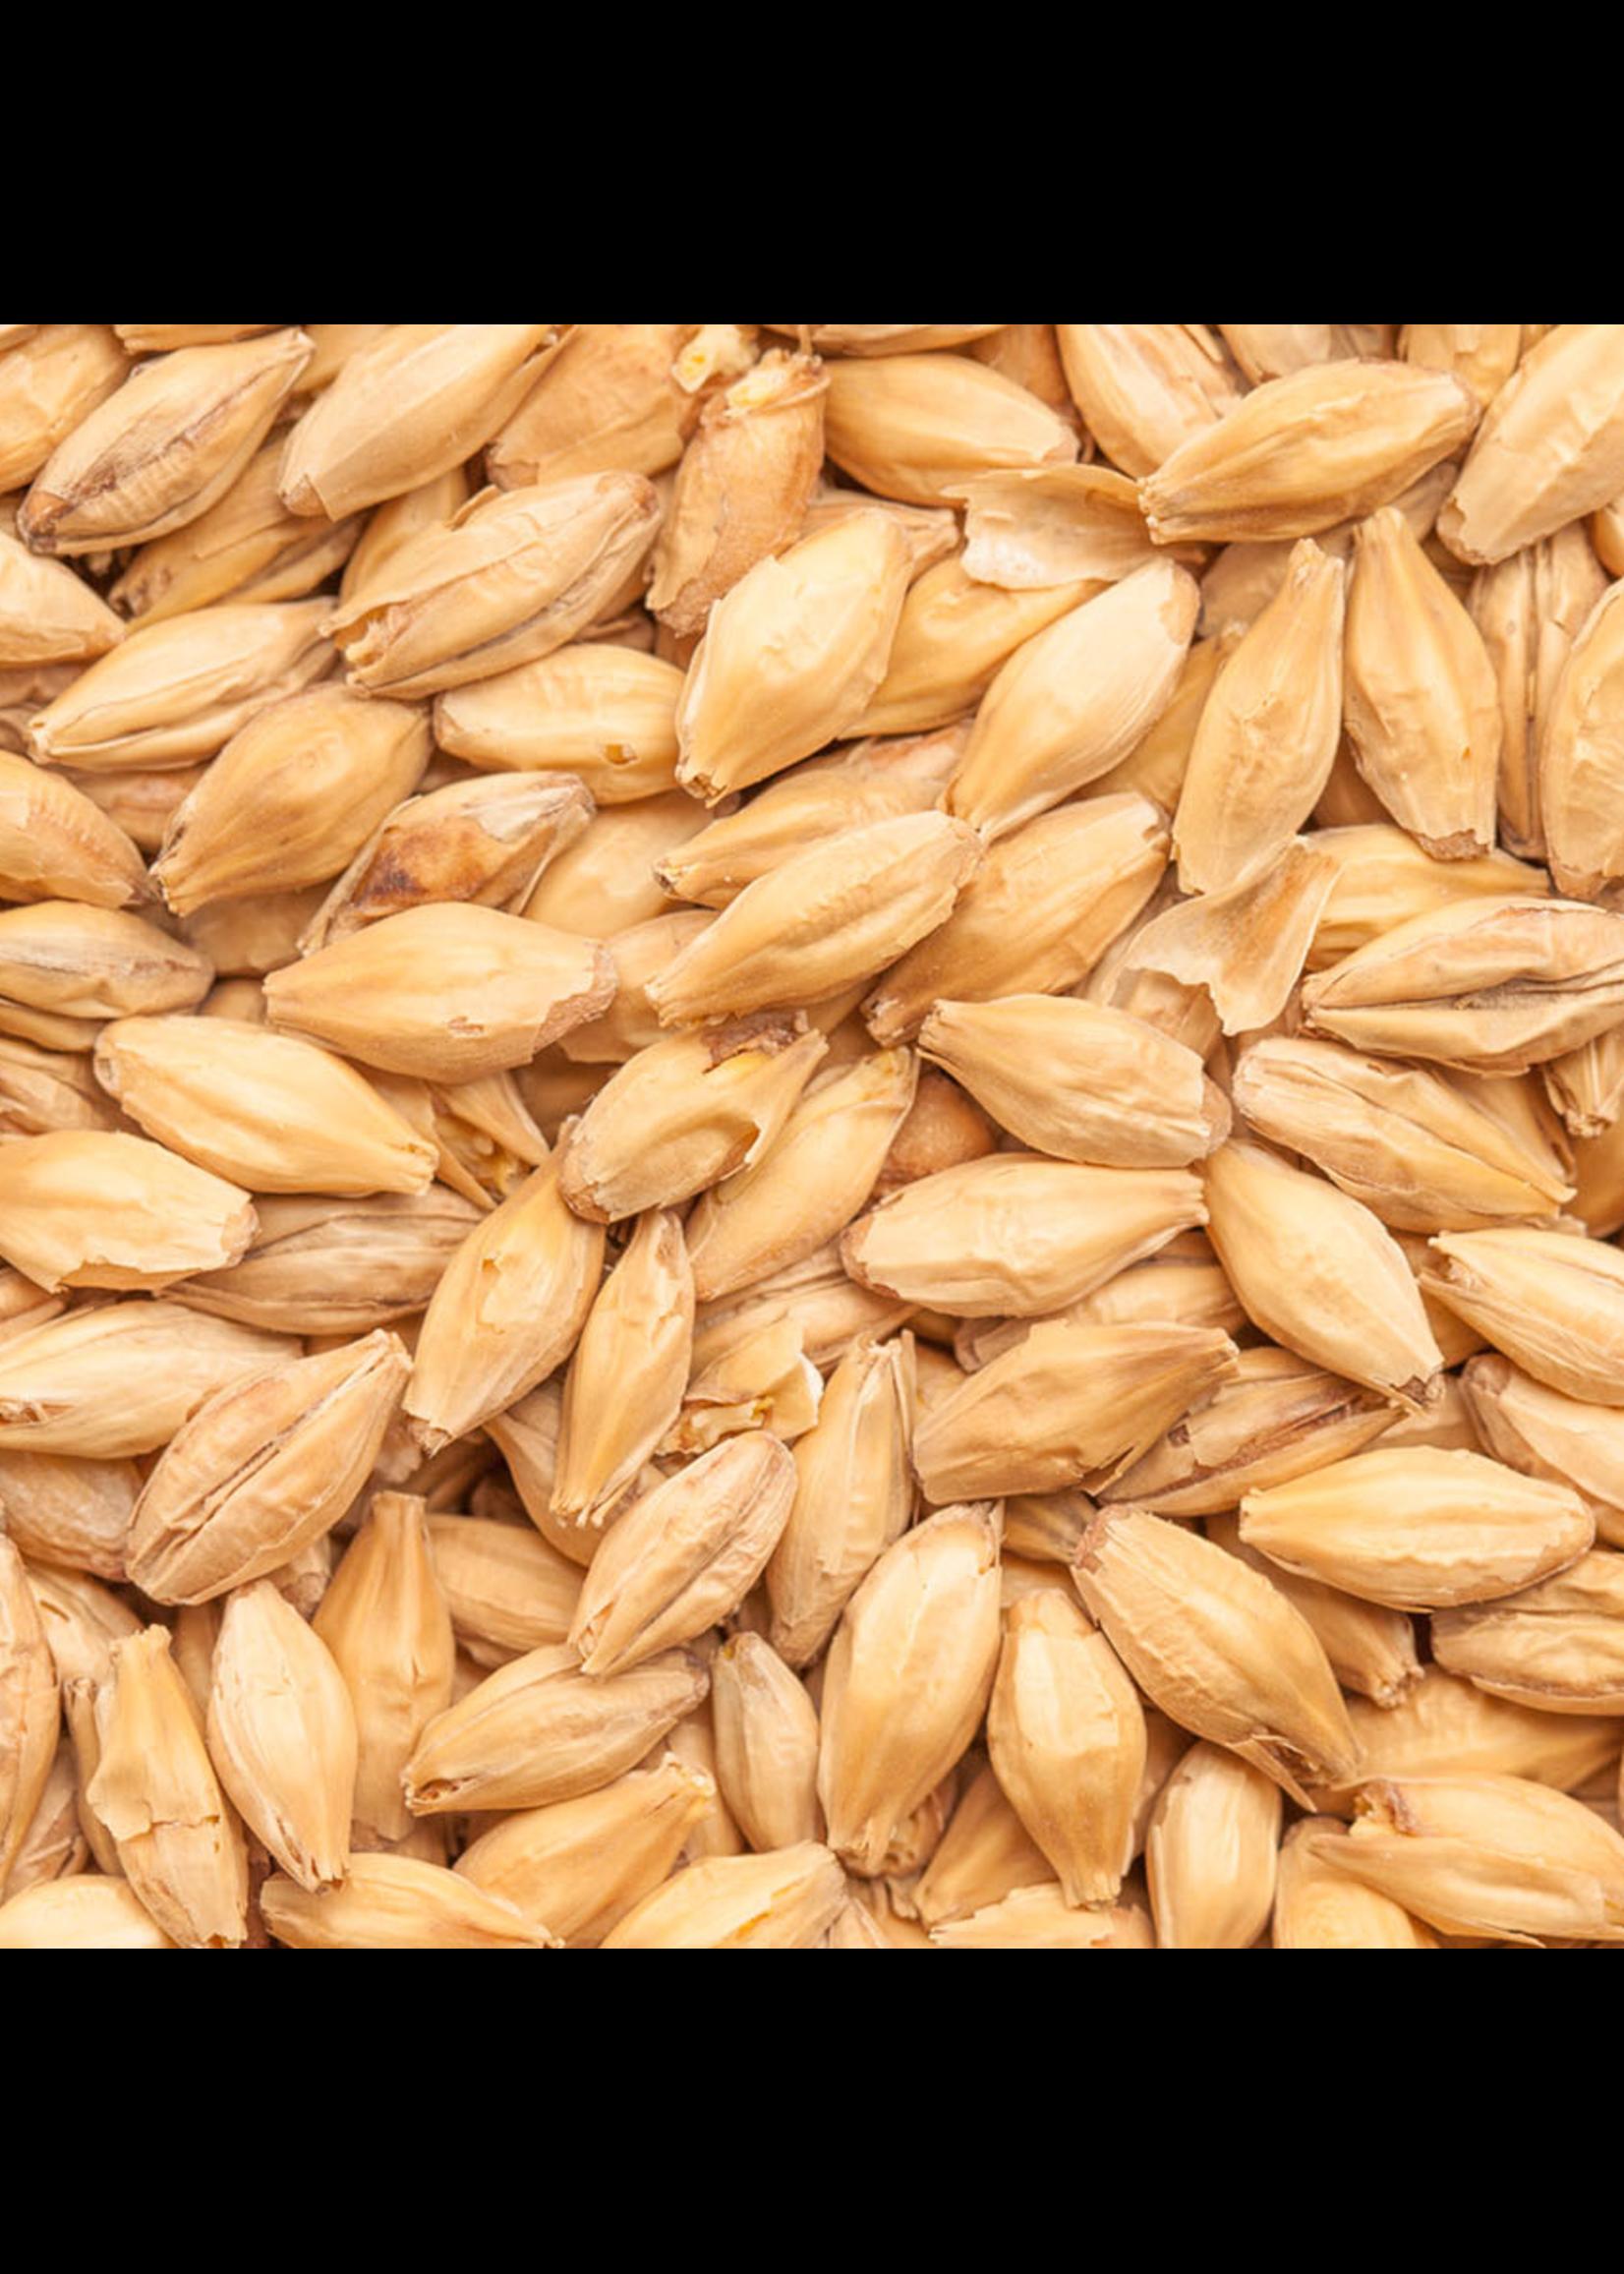 Grain Best Malz Heidelberg Malt - E7 - 1 LB